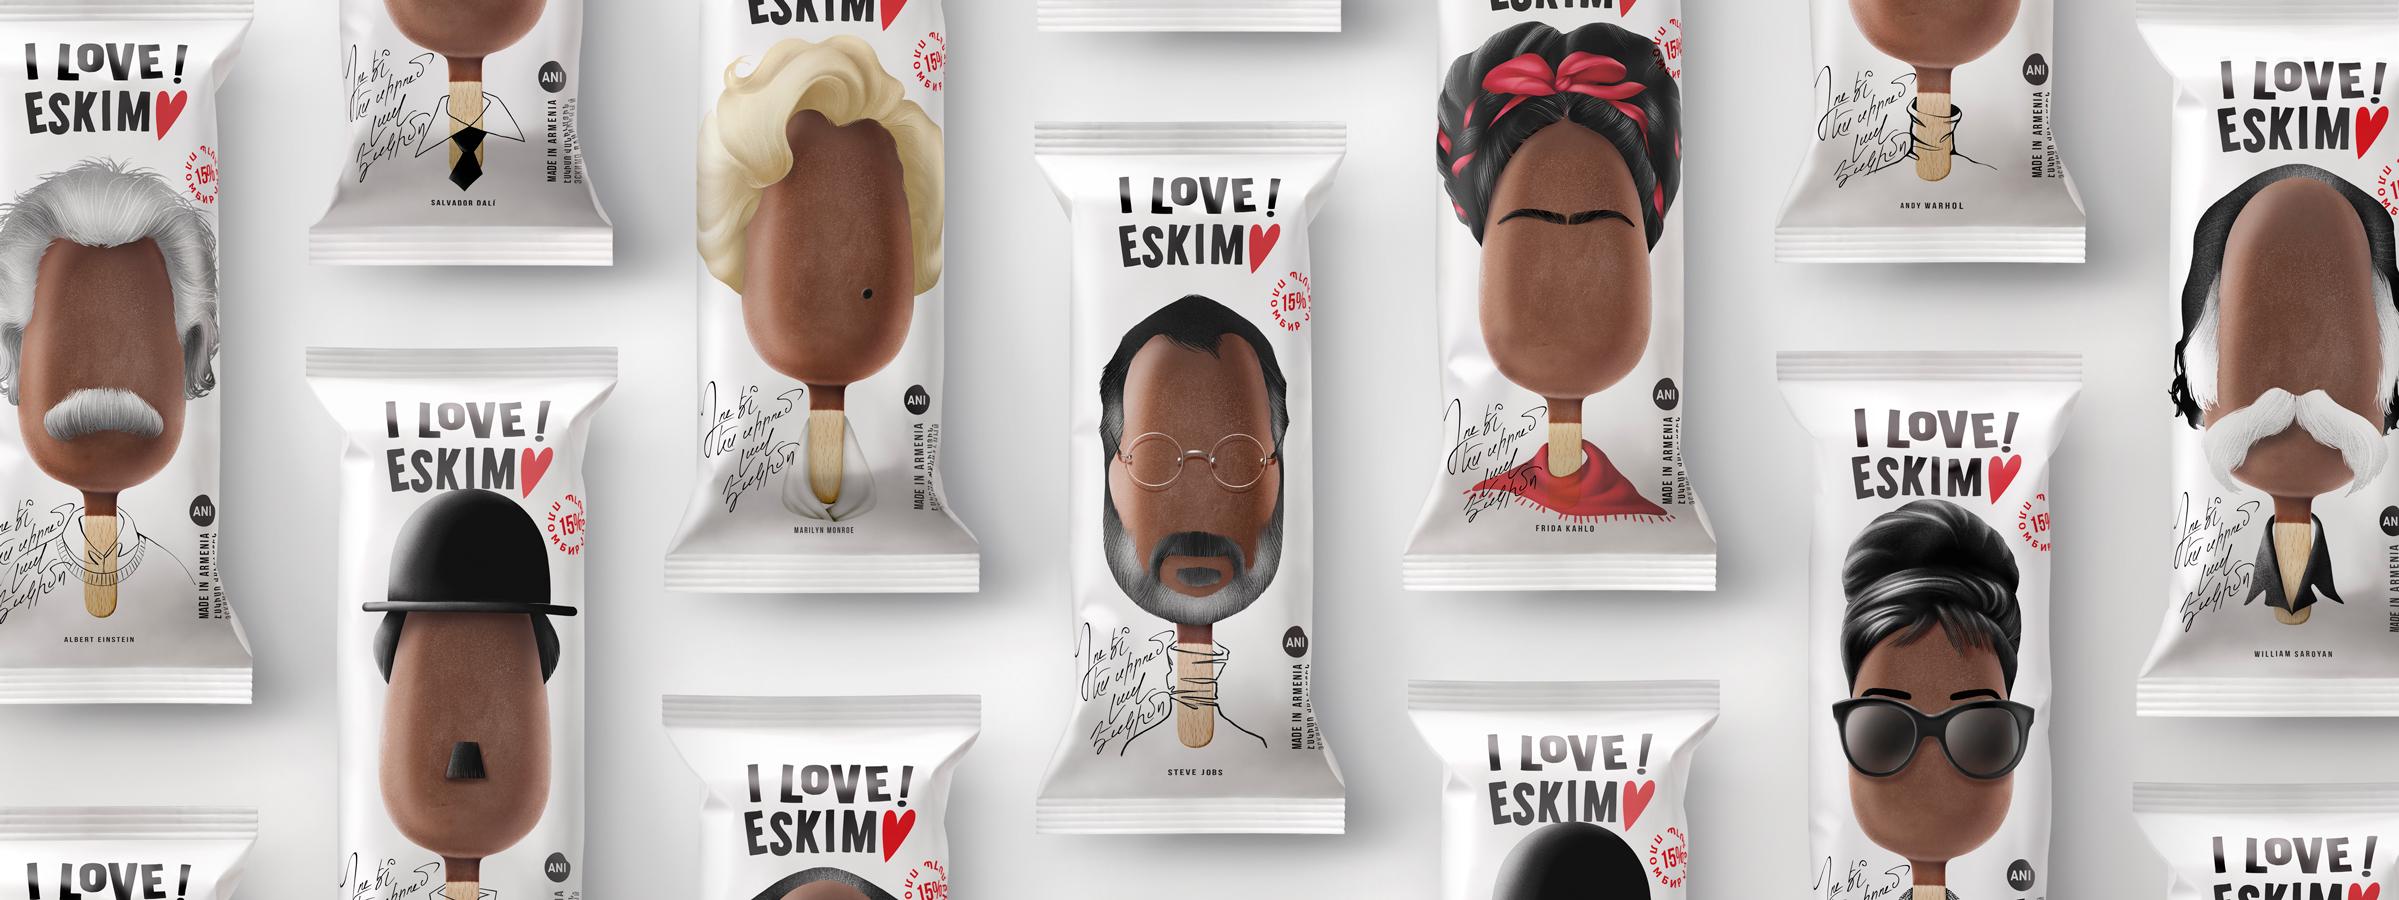 Backbone Branding Creates New Packaging for a Range of Butter-Based Ice Creams